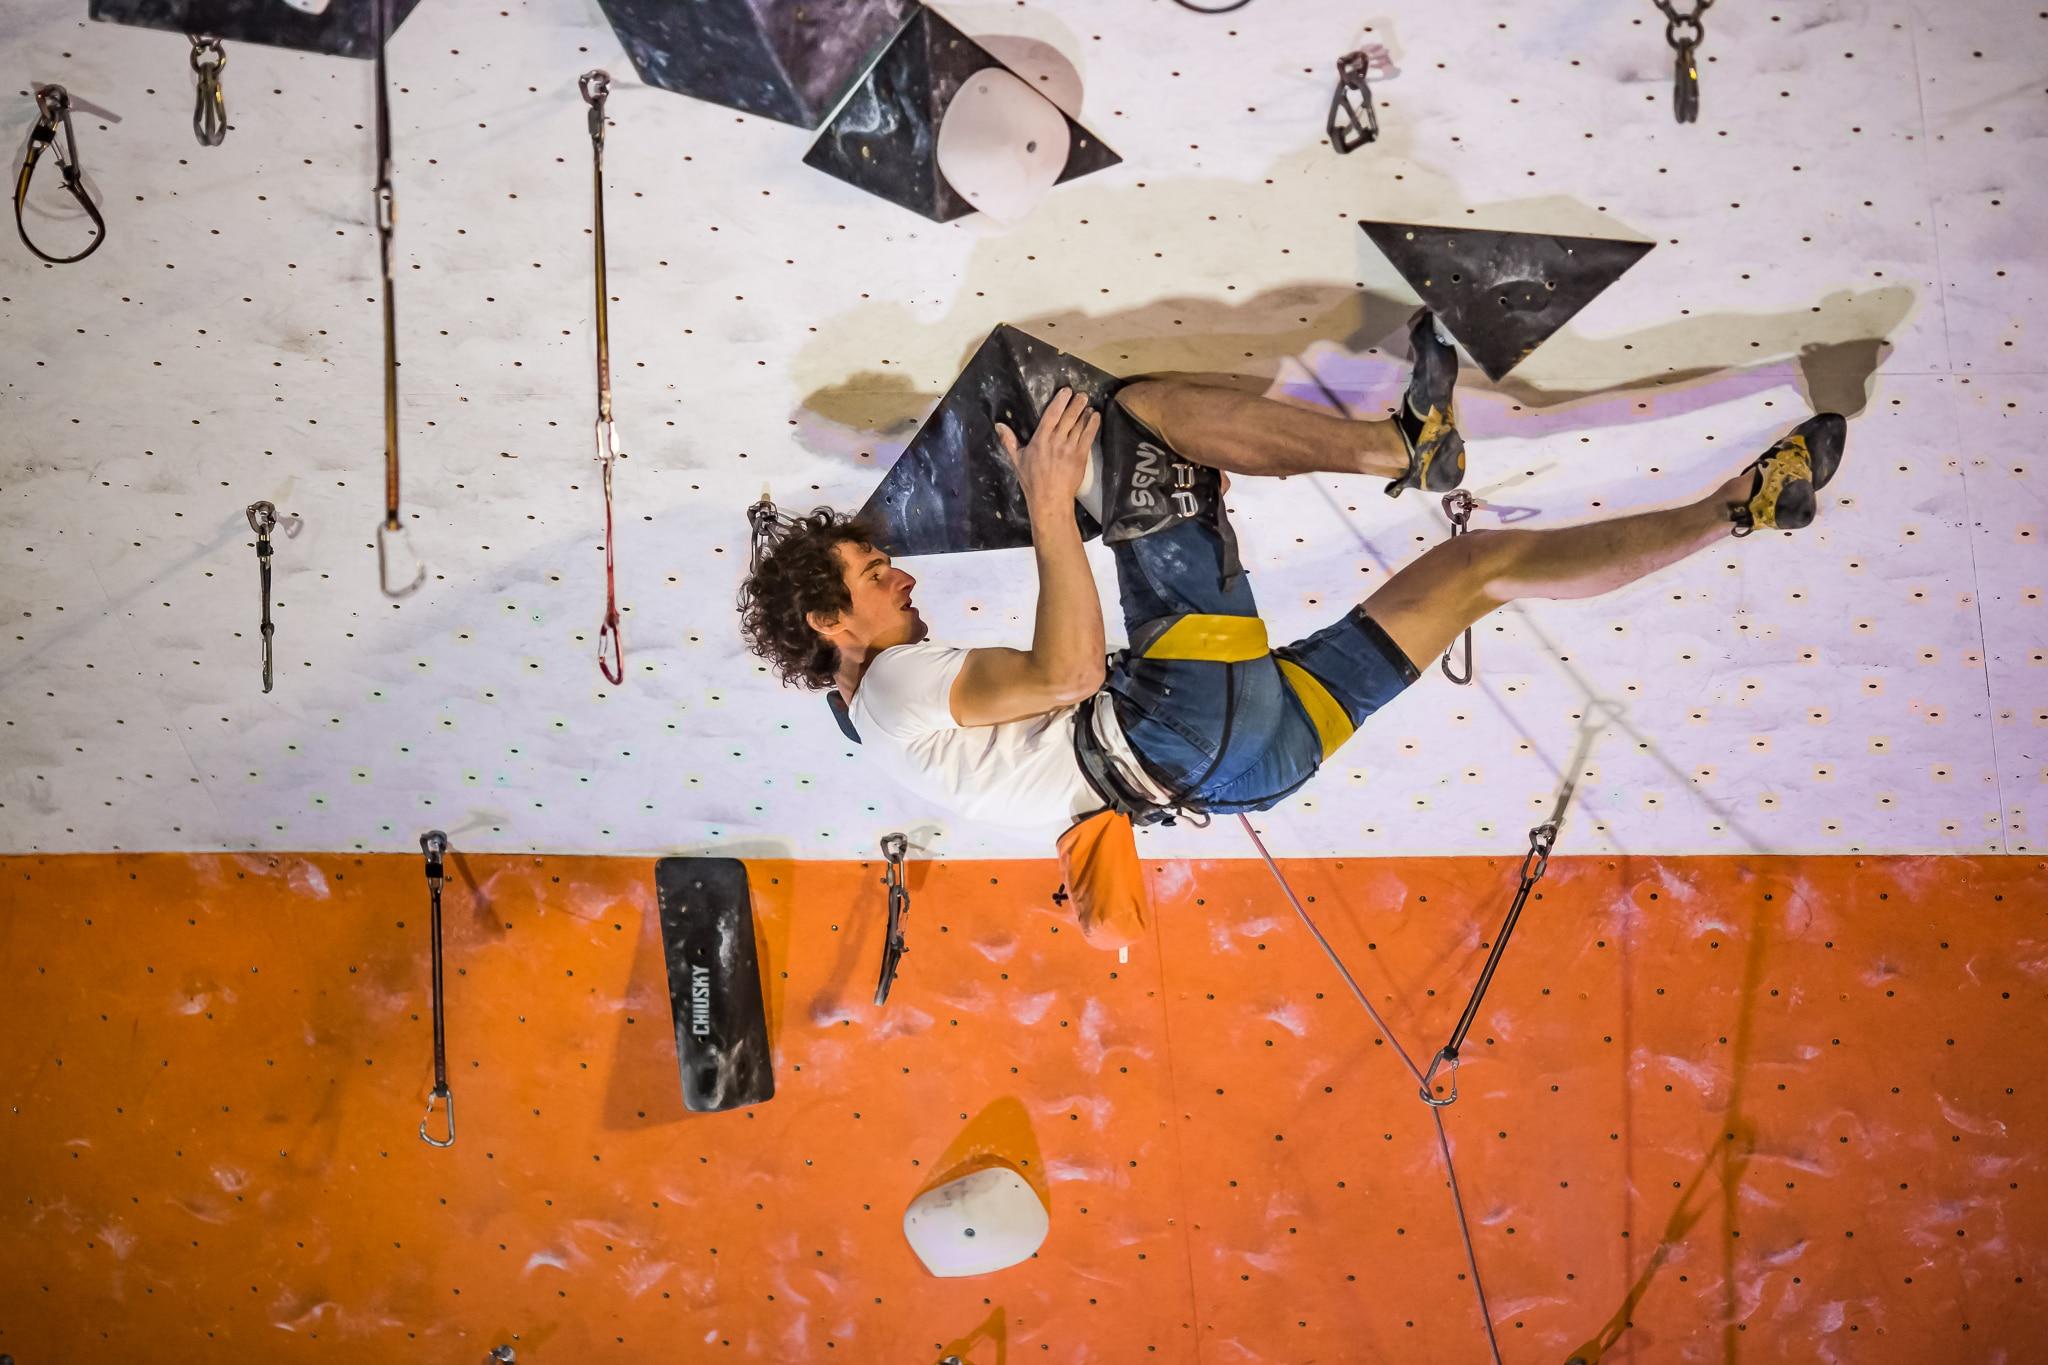 Adam Ondra, arrampicata